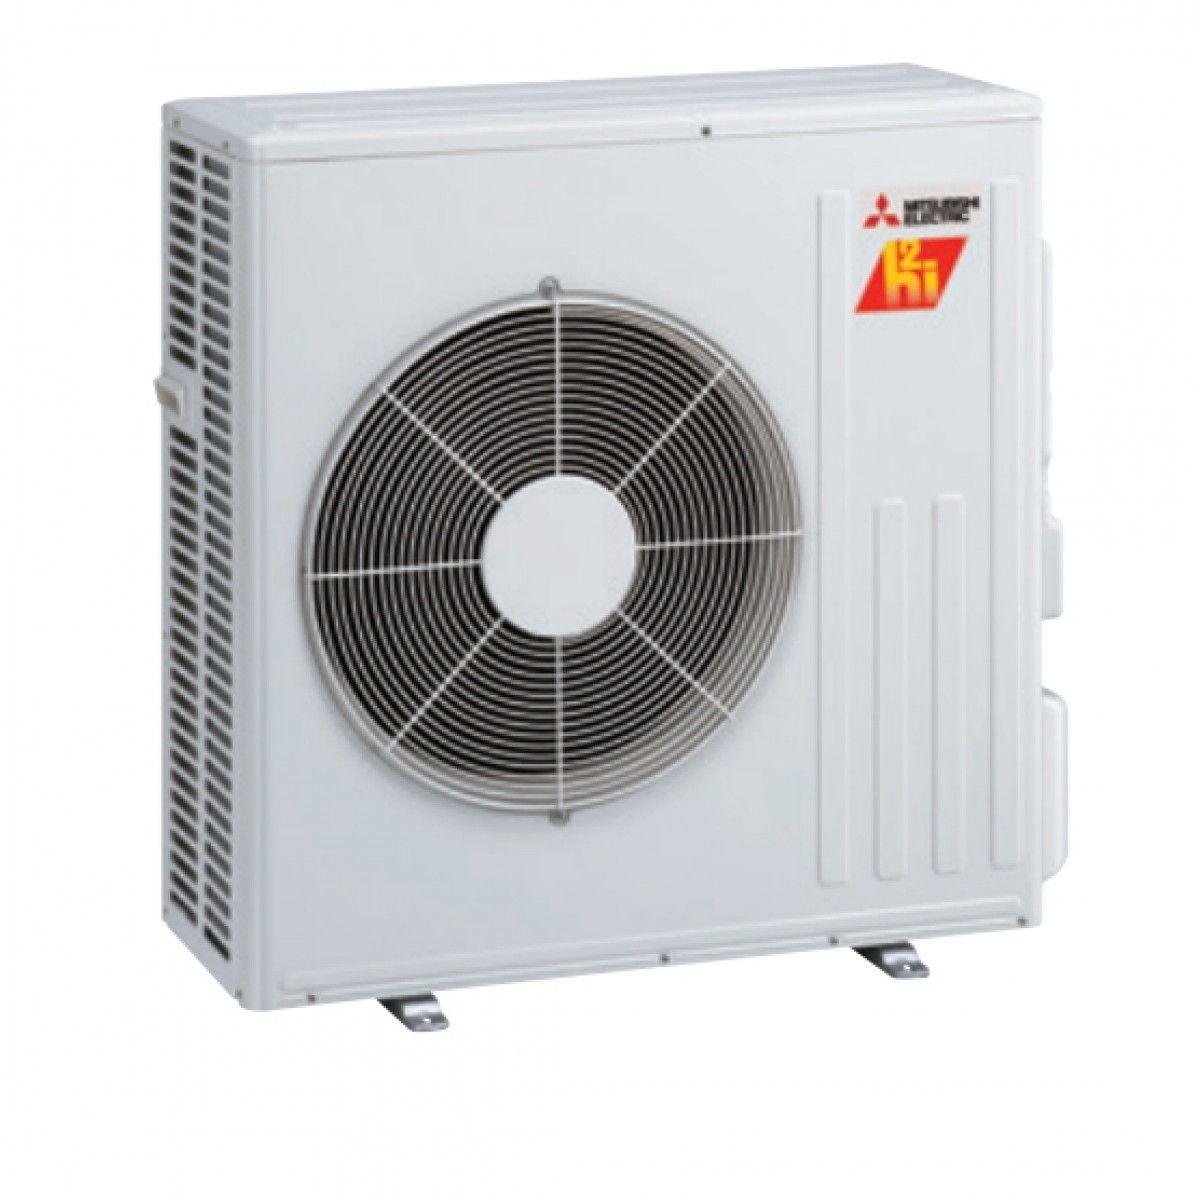 Mitsubishi 15K BTU Hyper Heat Condenser for Floor Mount (single zone only) in Outdoor Units ...